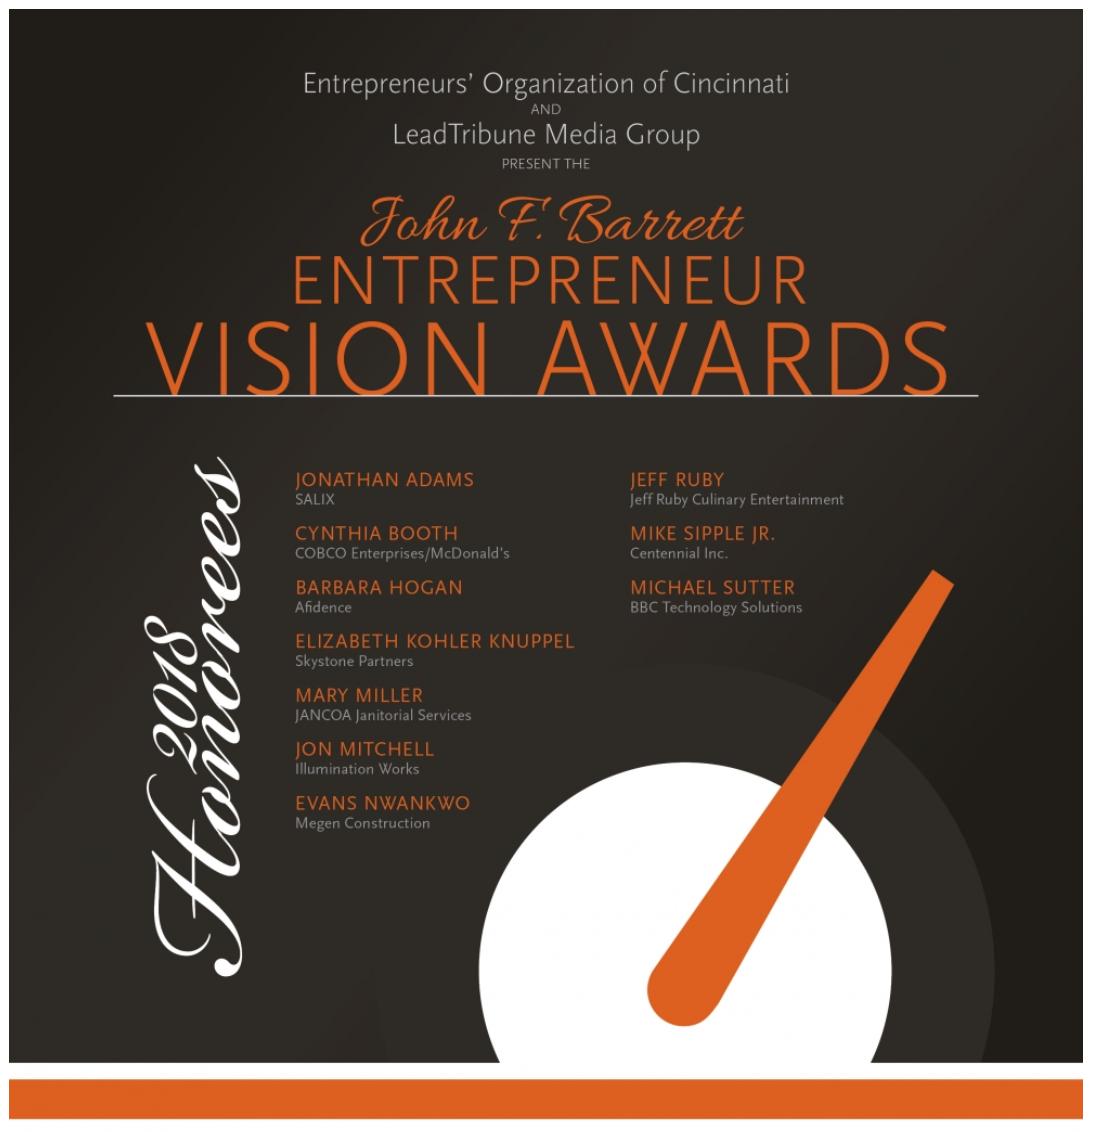 John F. Barrett Entrepreneur Vision Awards